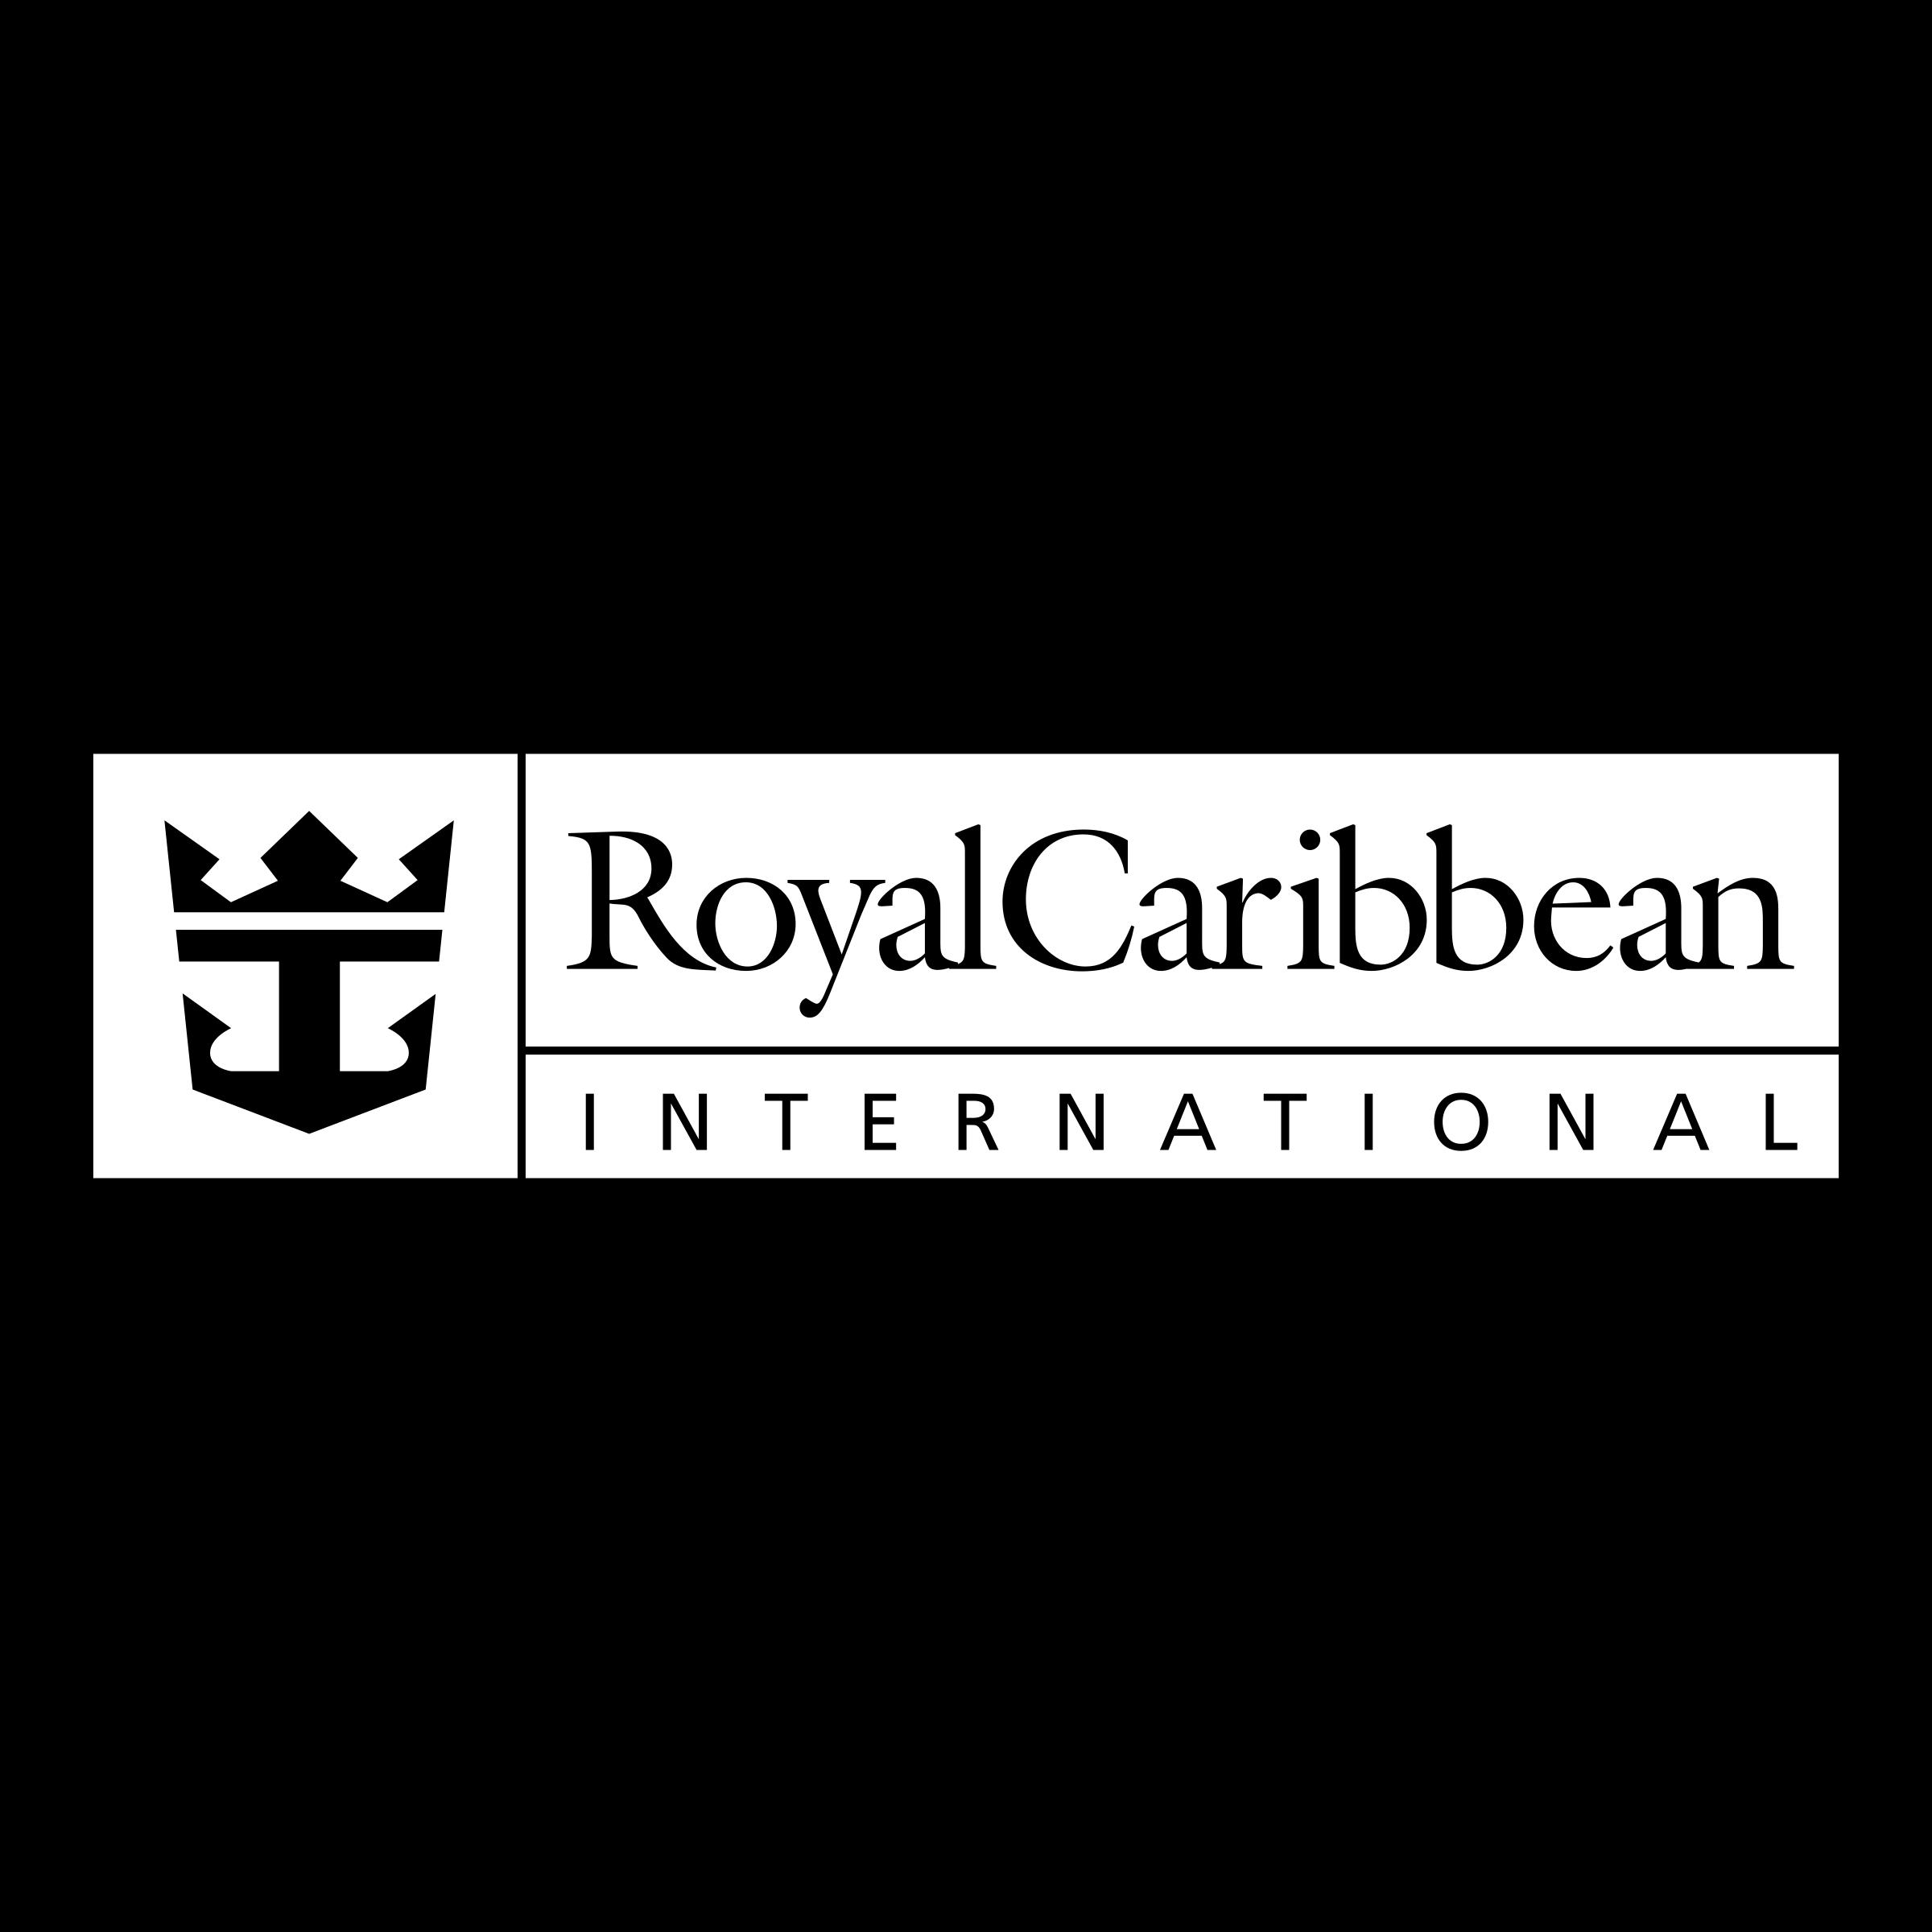 Royal Caribbean Logo PNG Transparent & SVG Vector.